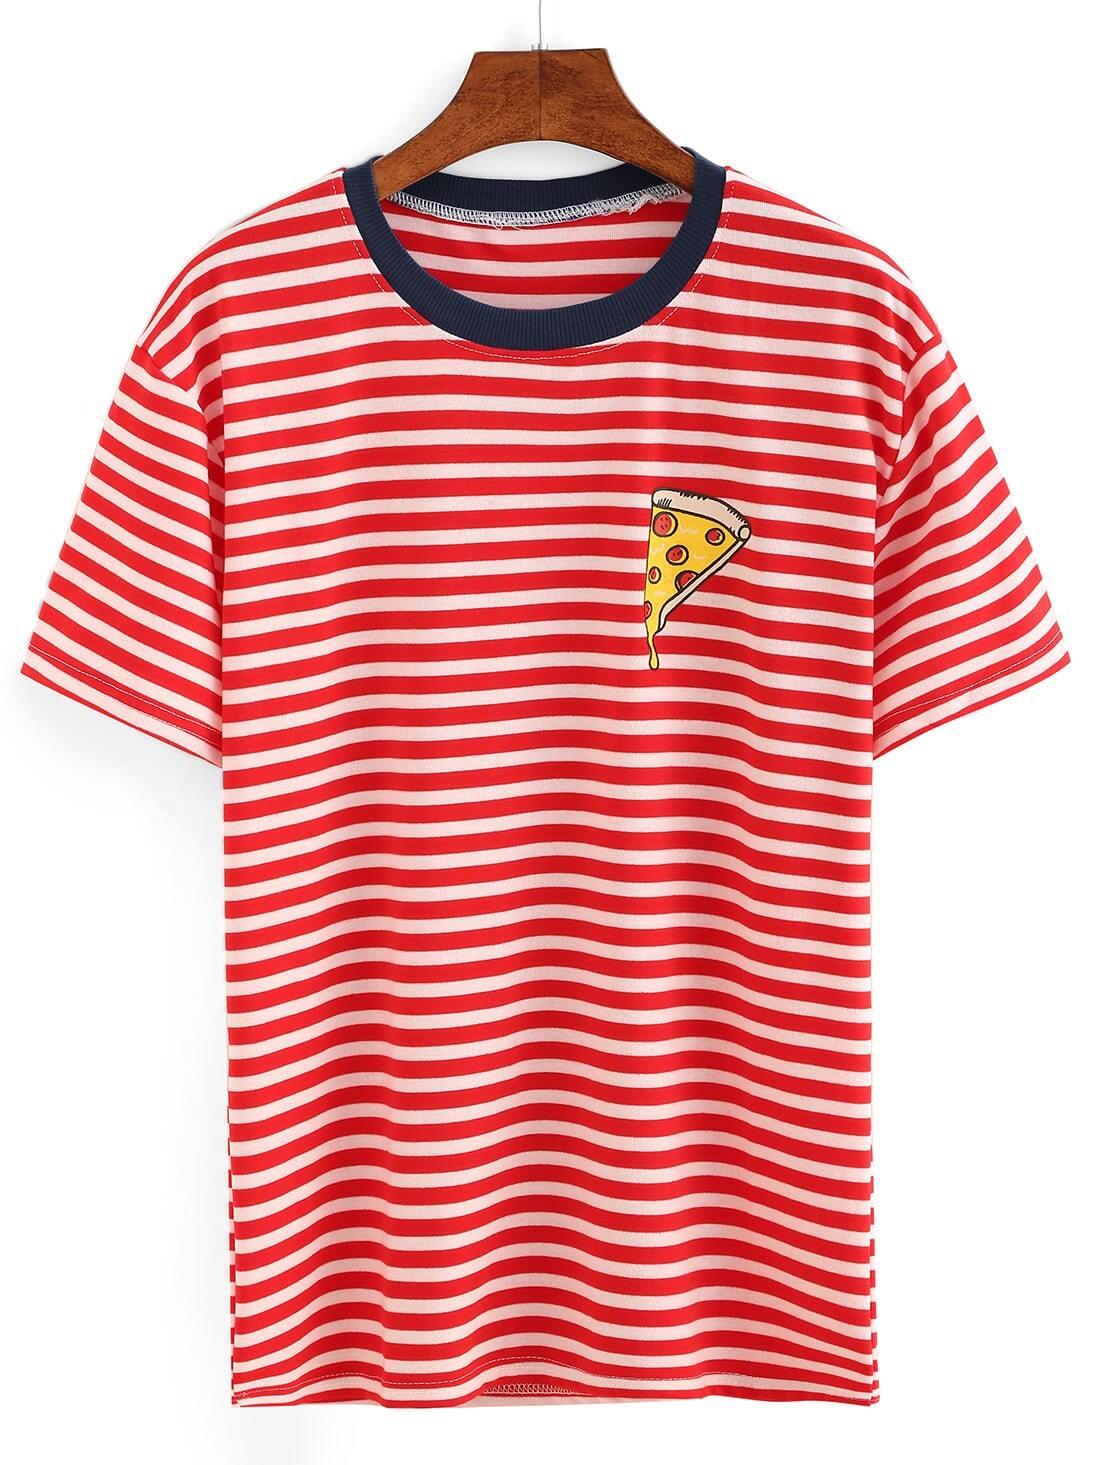 Contrast Trim Pizza Print Striped T-shirt RTSH161102599